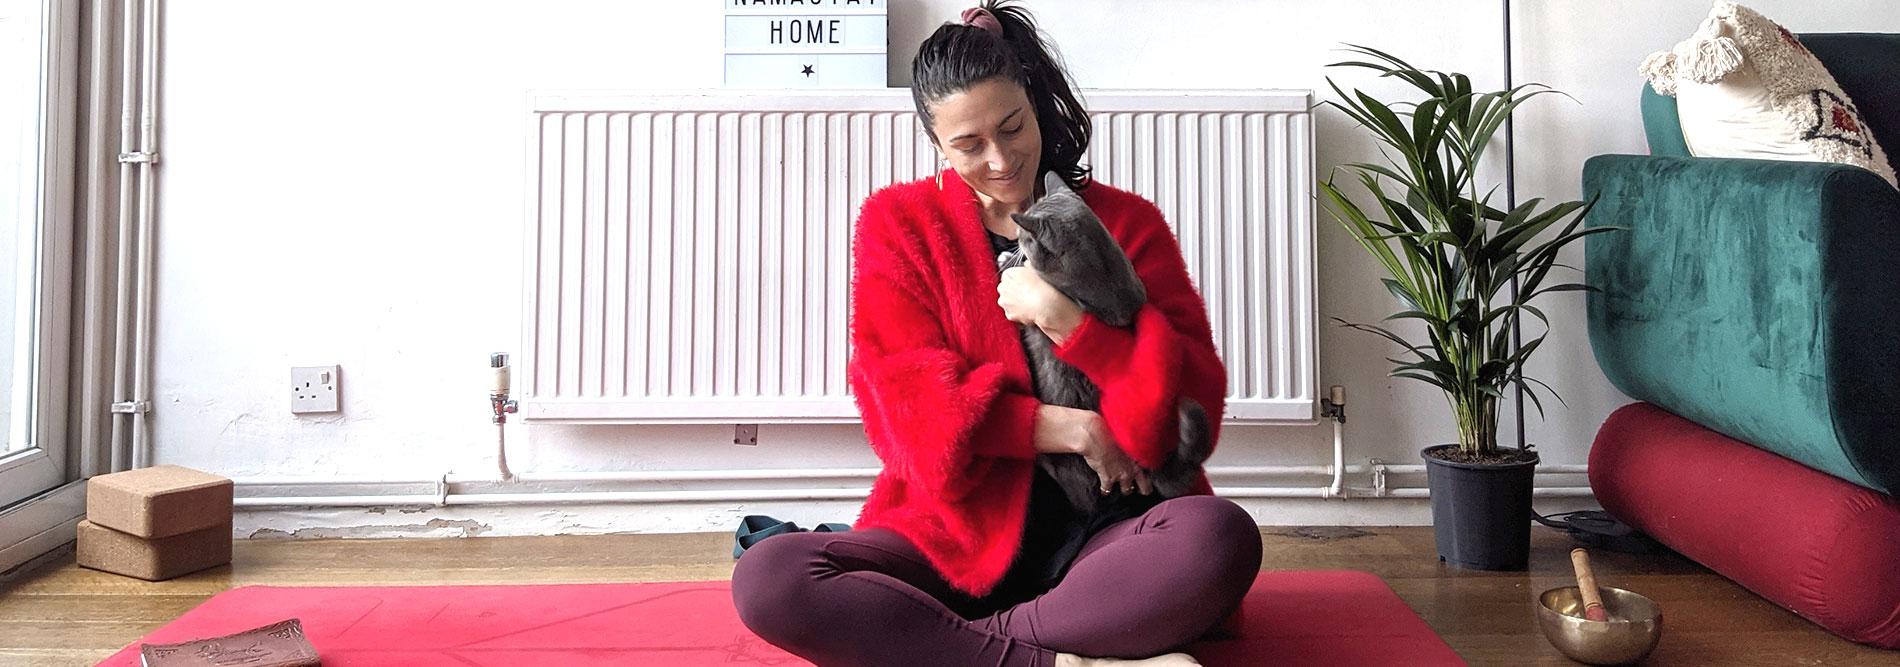 #2 Guided Meditation & Pranayama — 10min video